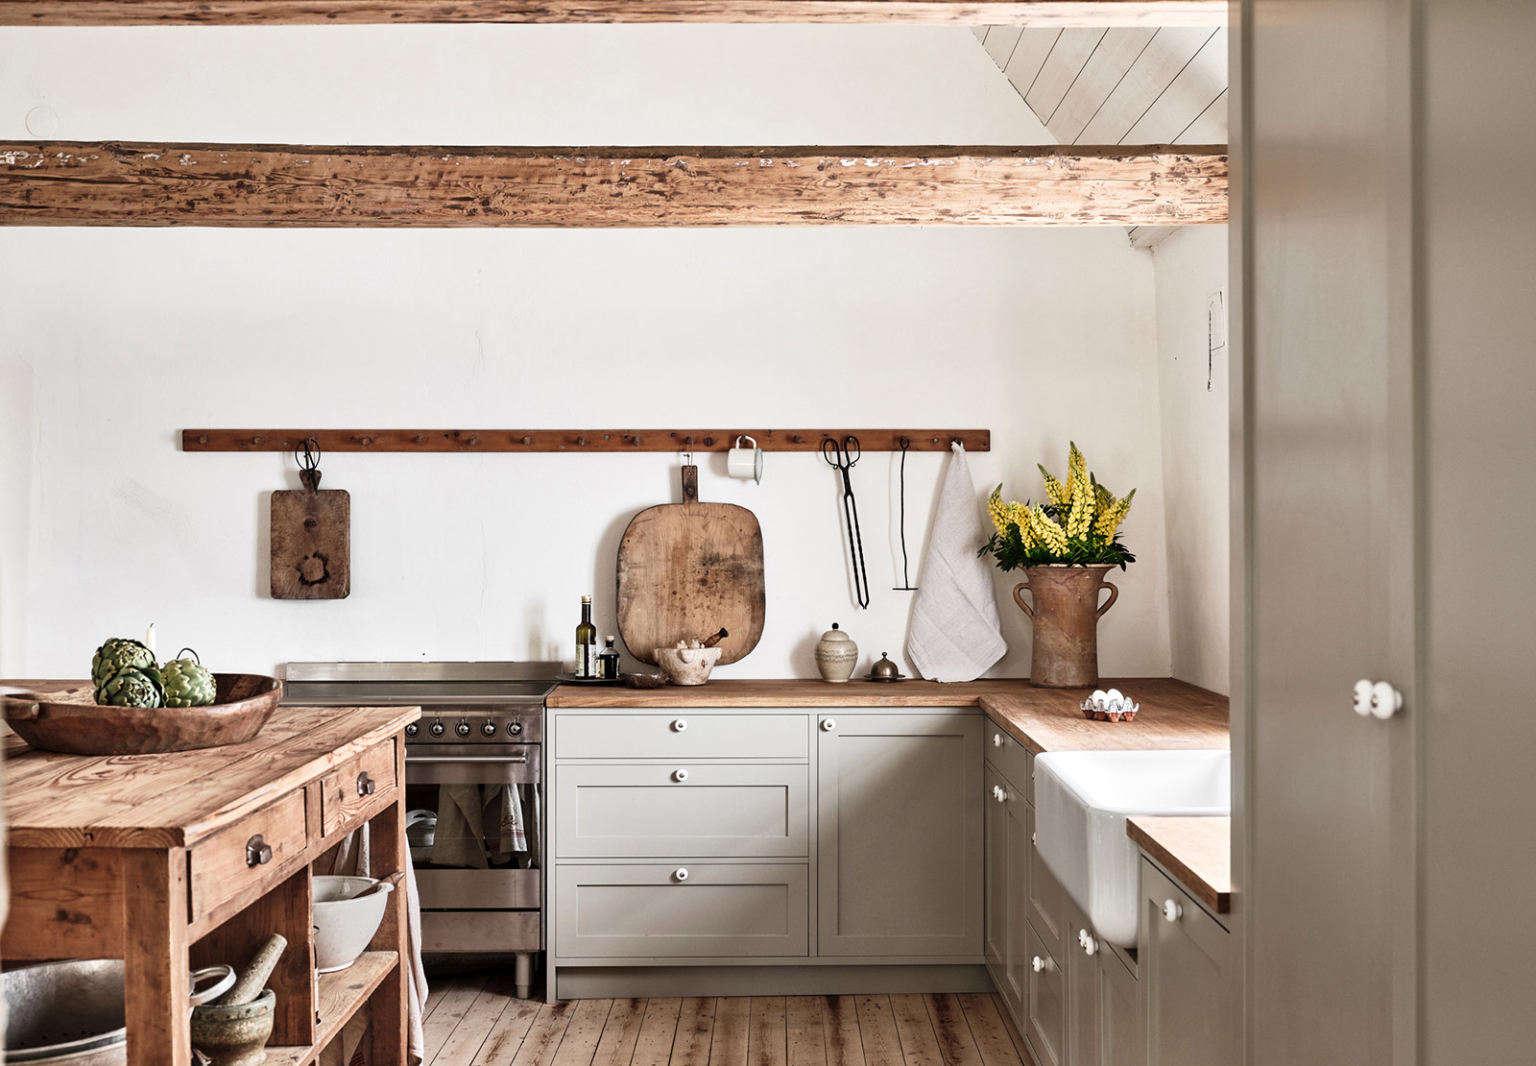 nordiska kok shaker kitchen ellen dixdotter jacob holst osterlen denmark 2 1536x1066